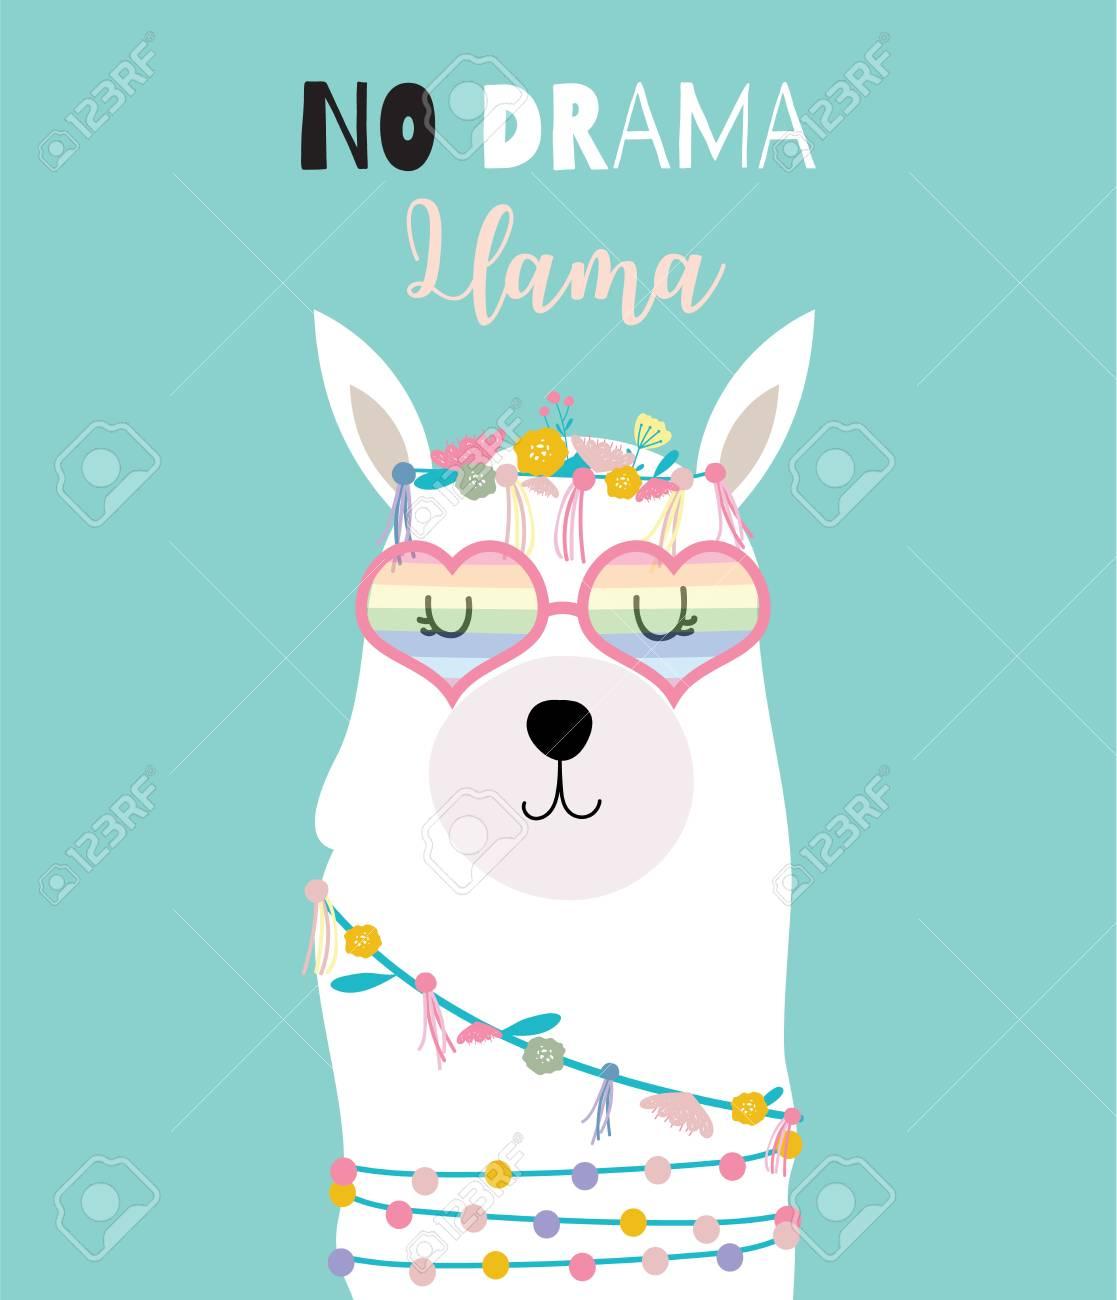 cbfbf1850 Blue green hand drawn cute card with llama,heart glasses in summer.No drama